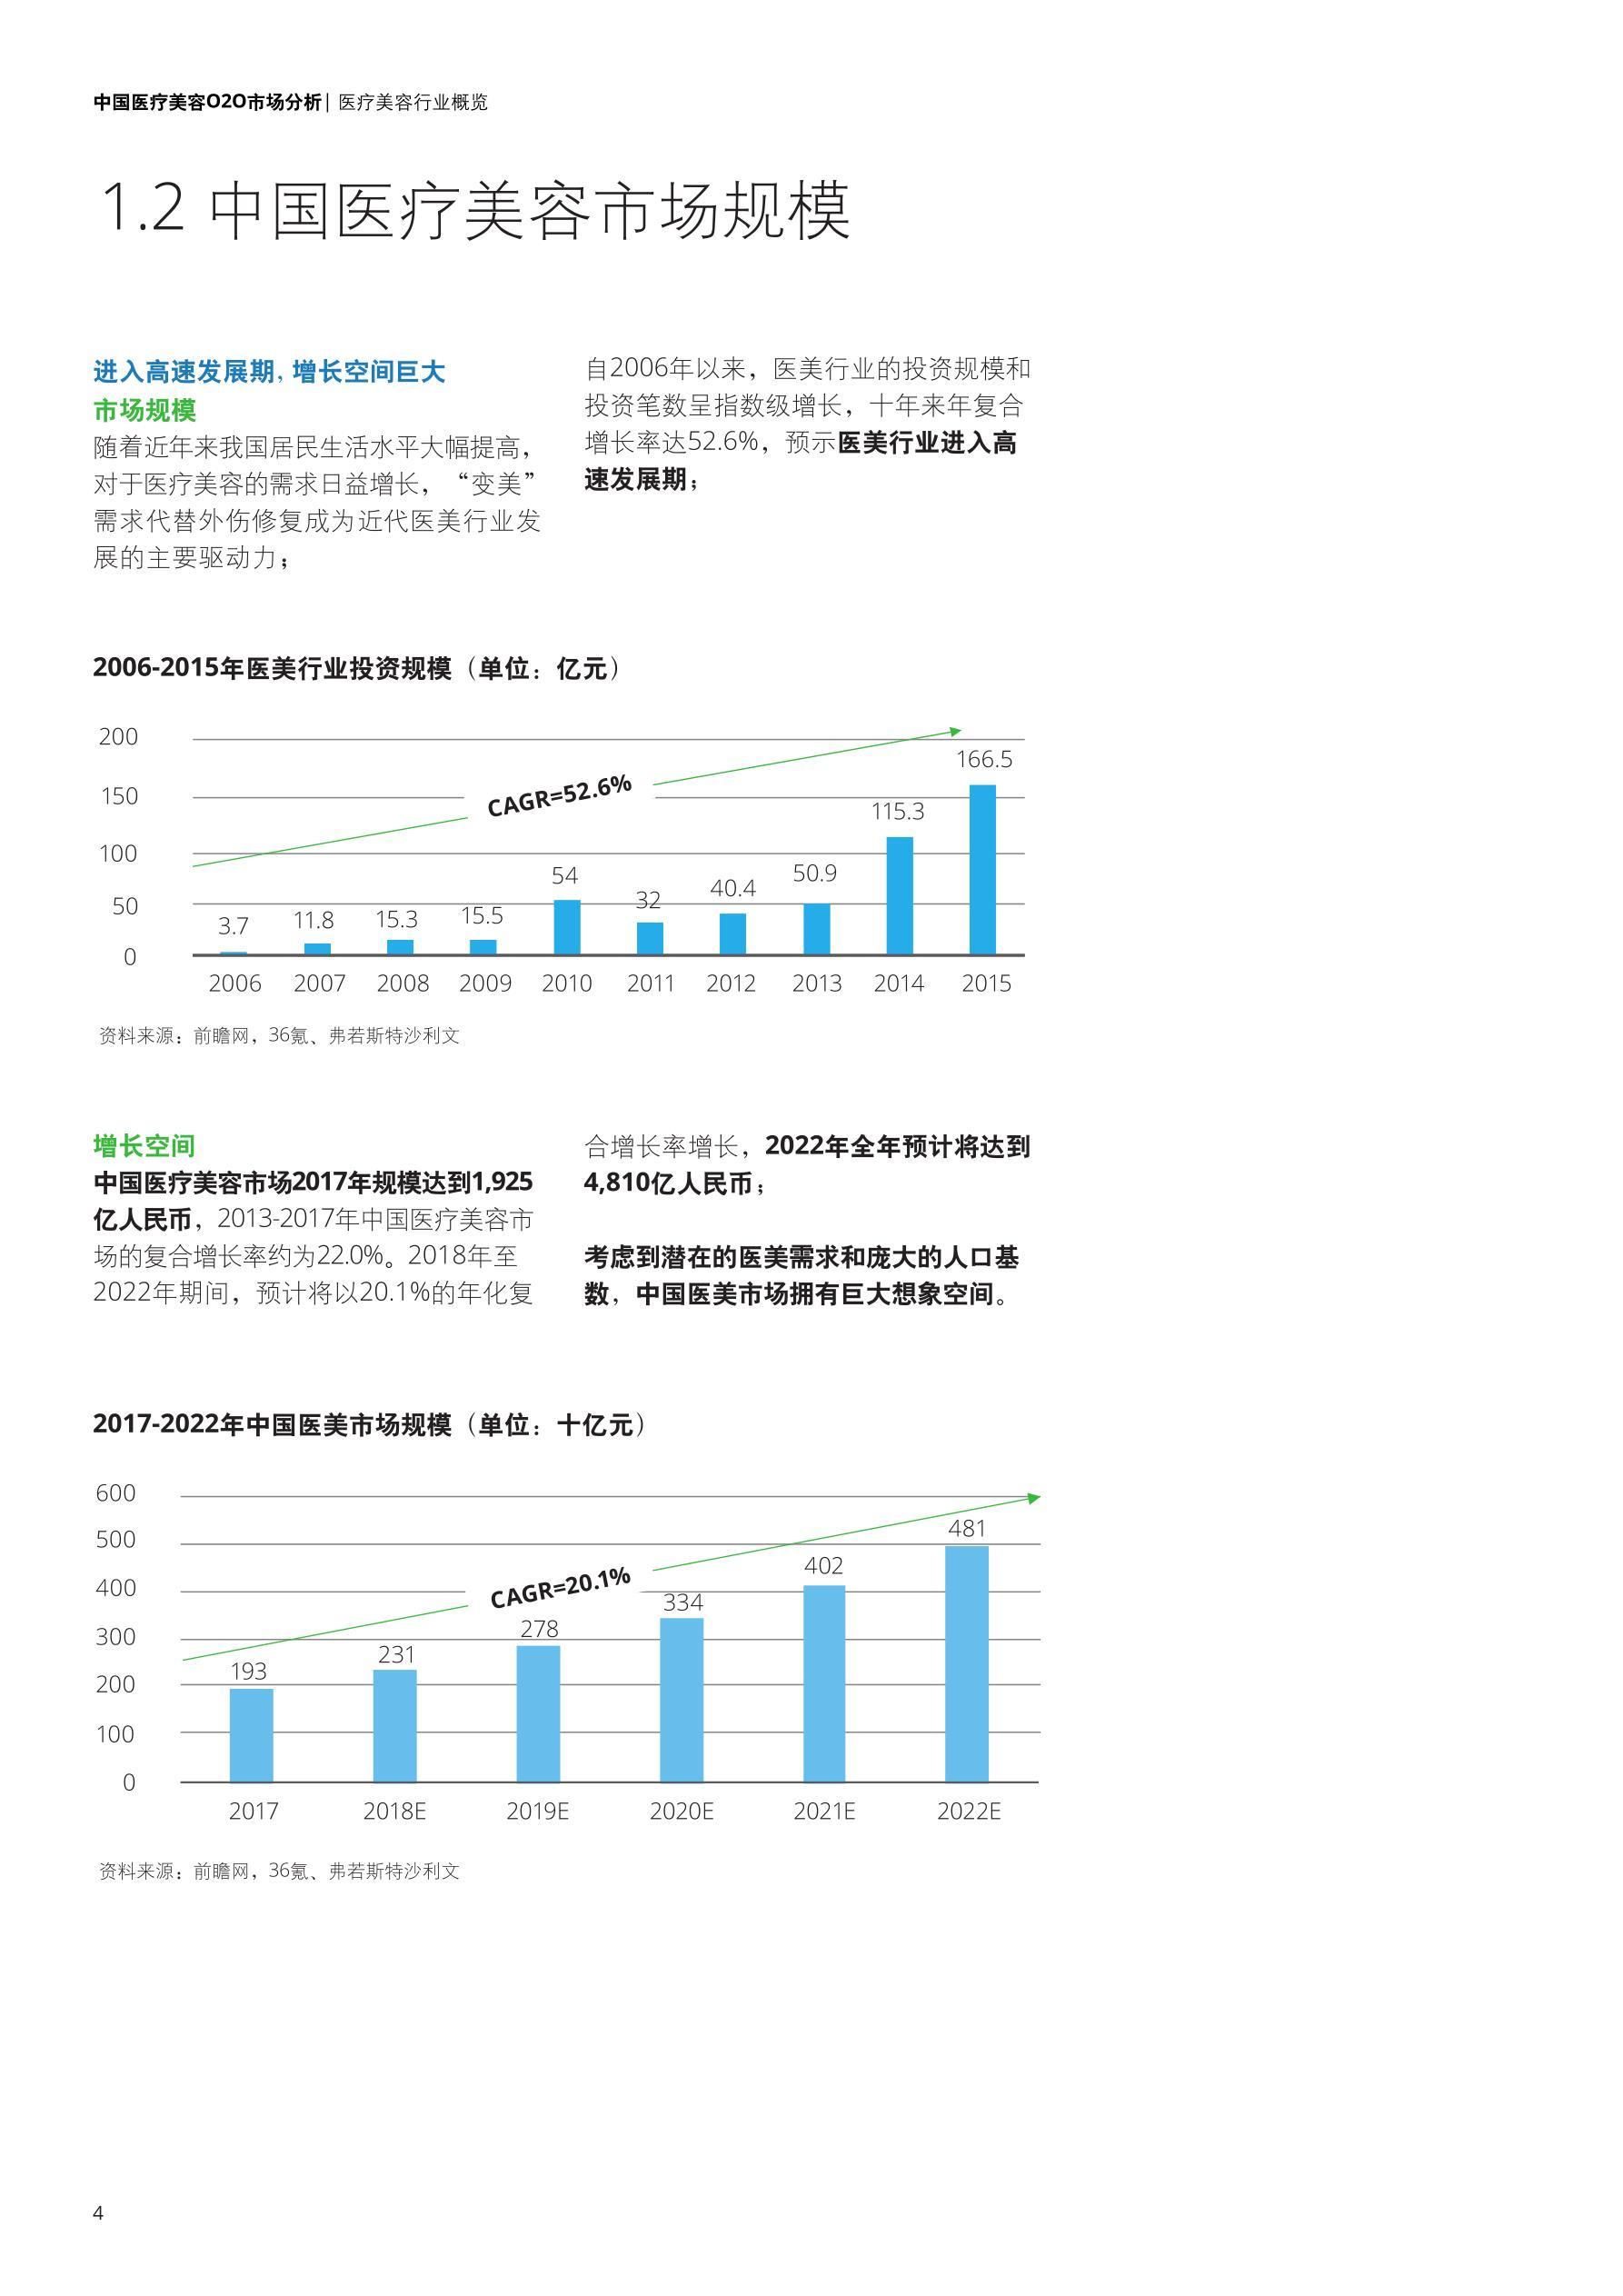 deloitte-cn-lshc-china-medical-cosmetology-o2o-market-analysis-zh-180914(1)_看图王_6